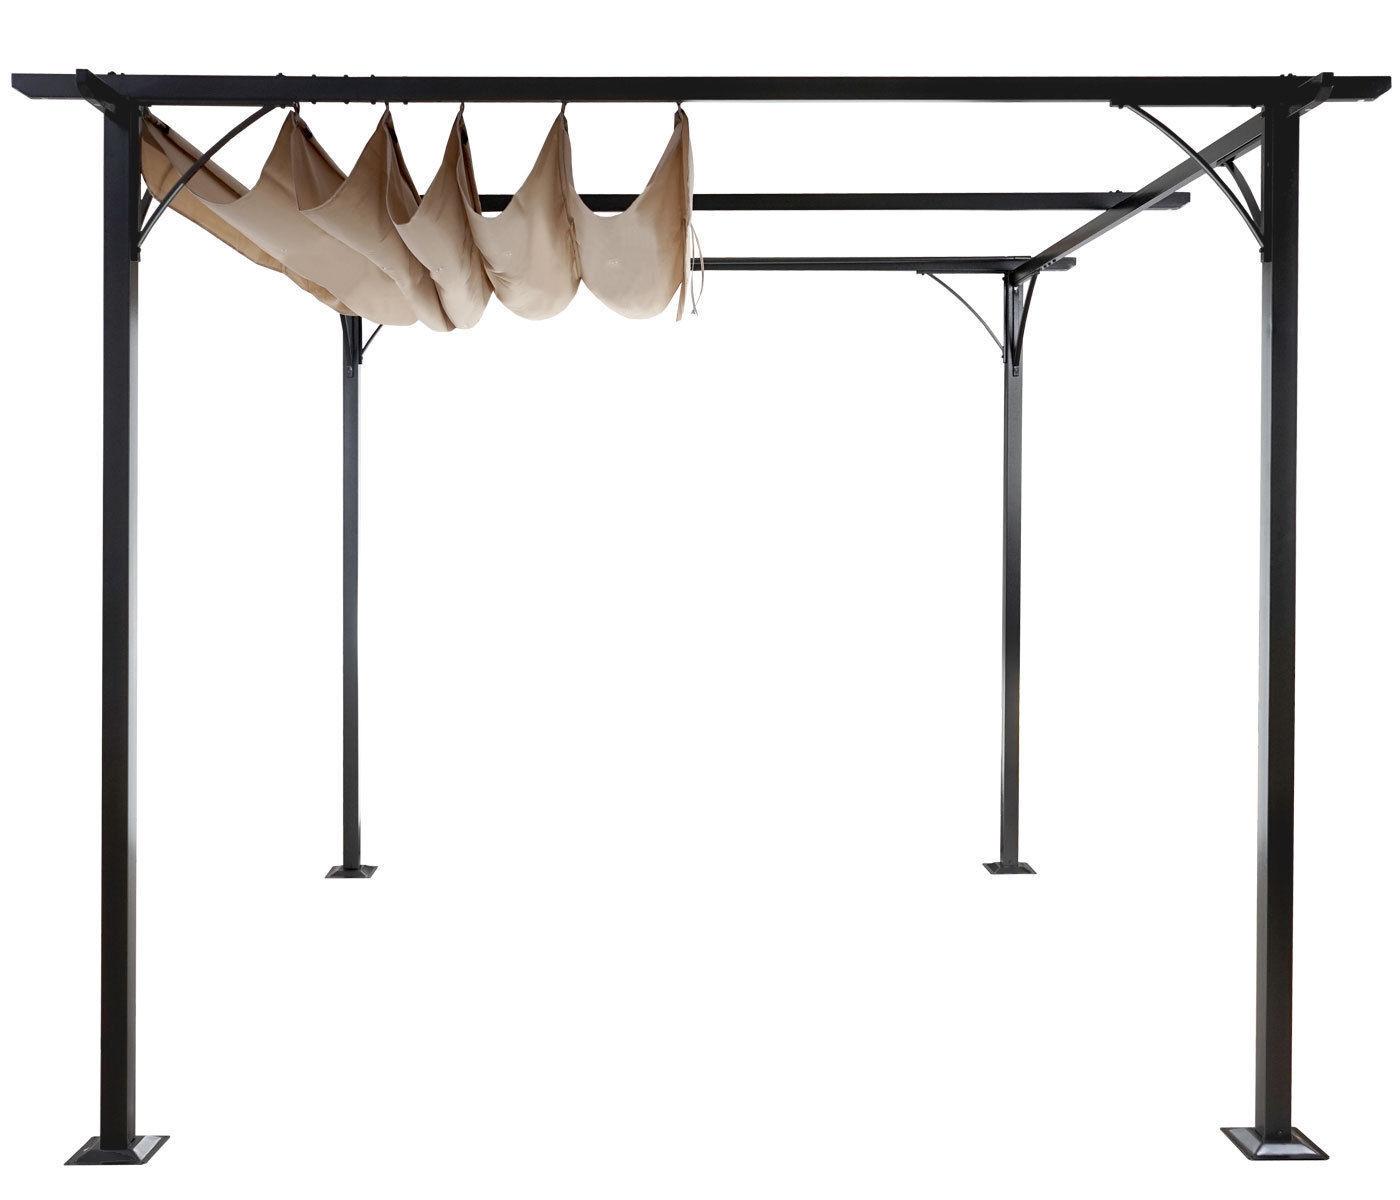 3x3 m pavillon garten pergola sonnenschutz terrassen. Black Bedroom Furniture Sets. Home Design Ideas